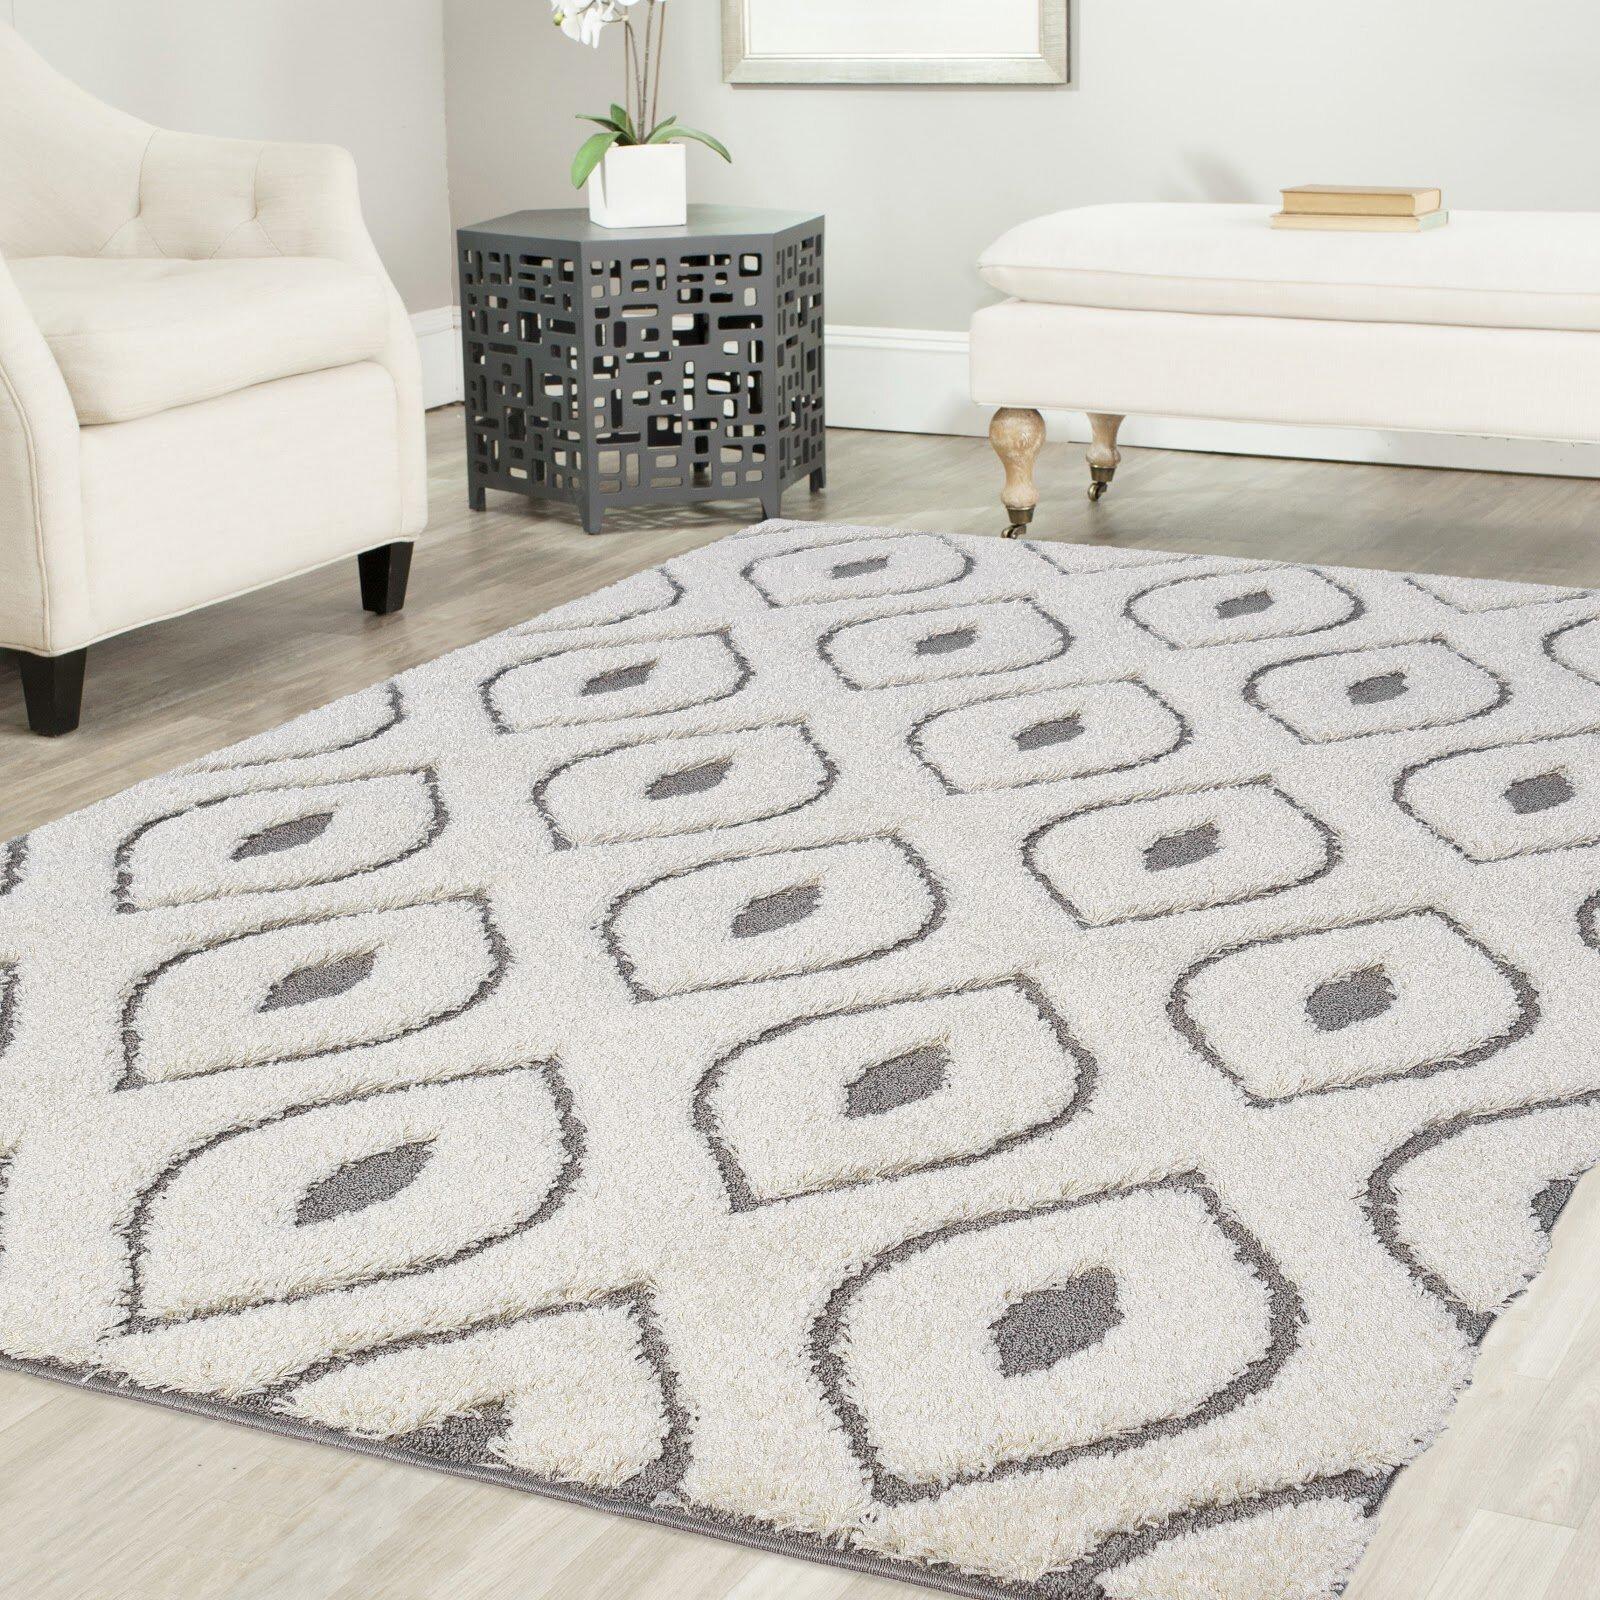 Tapis Long Poil Blanc tapis blanc/gris marocain poils longs ruiz